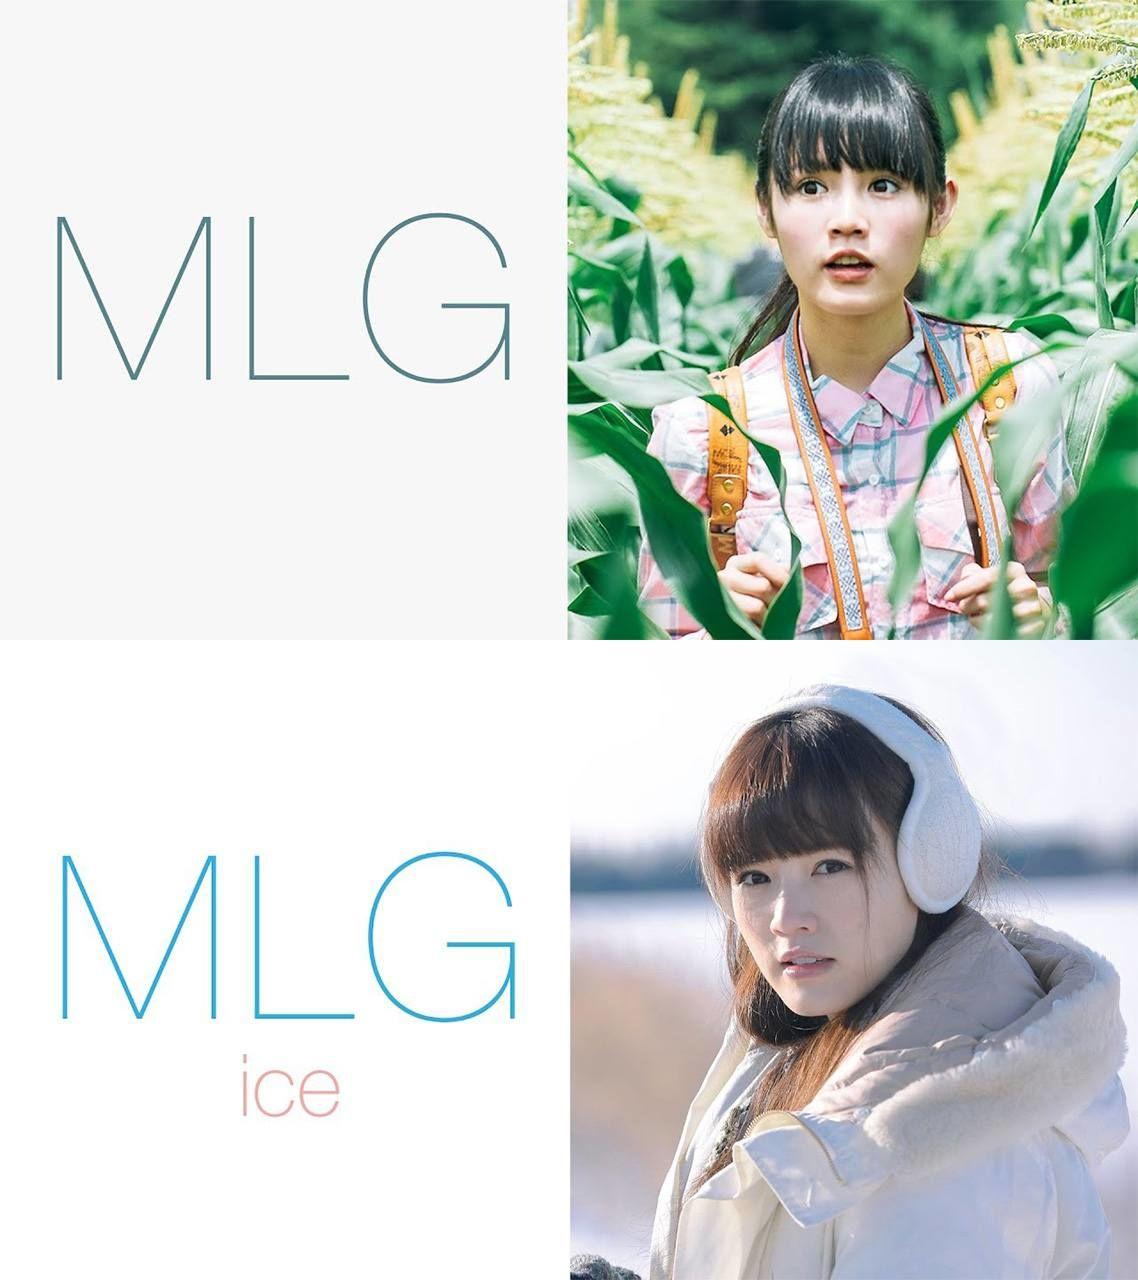 日台合作の短編映画「My little guidebook」と続編の「My little guidebook - ICE」(Nobu/粟田経弘氏提供)